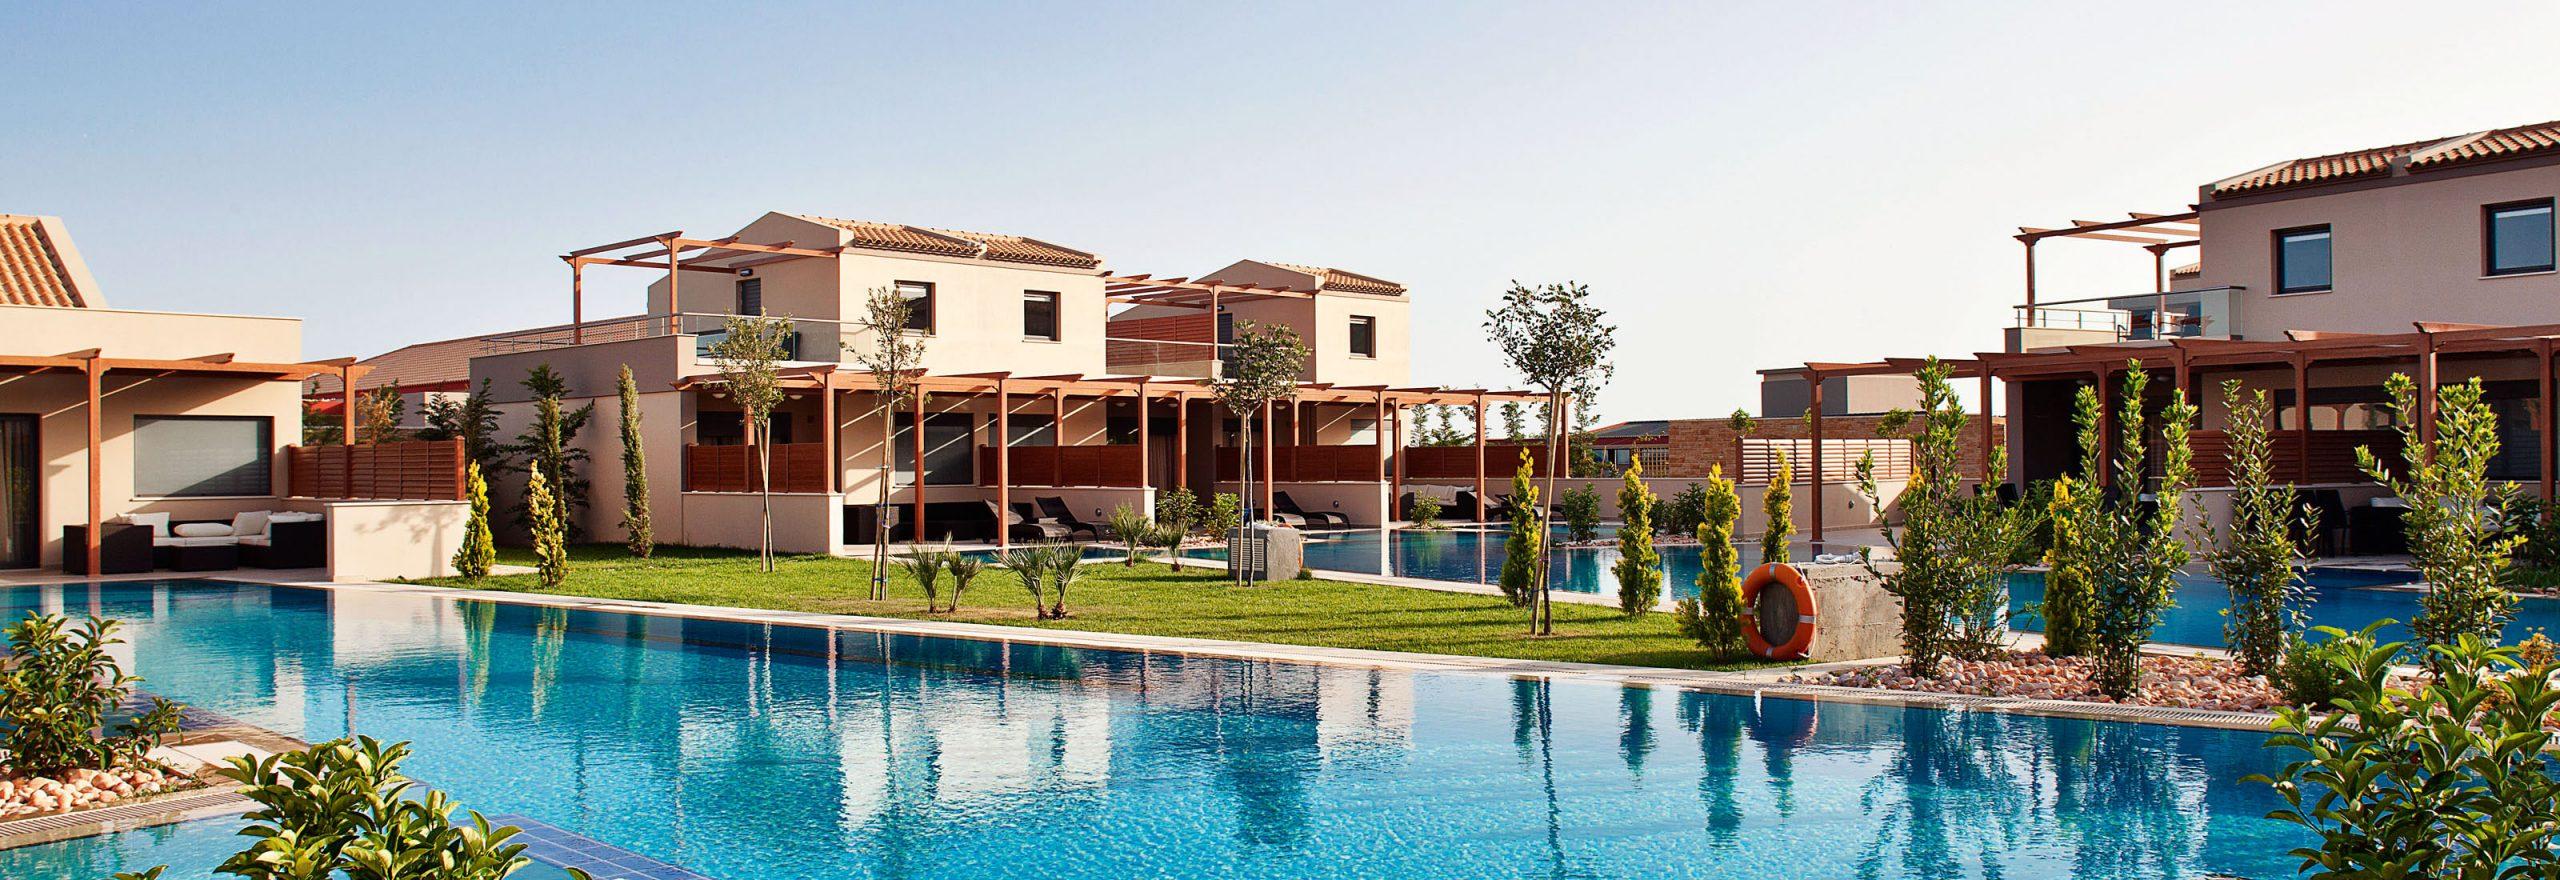 Hotel Apollonion Resort & Spa, Lixuri, Kefalonia